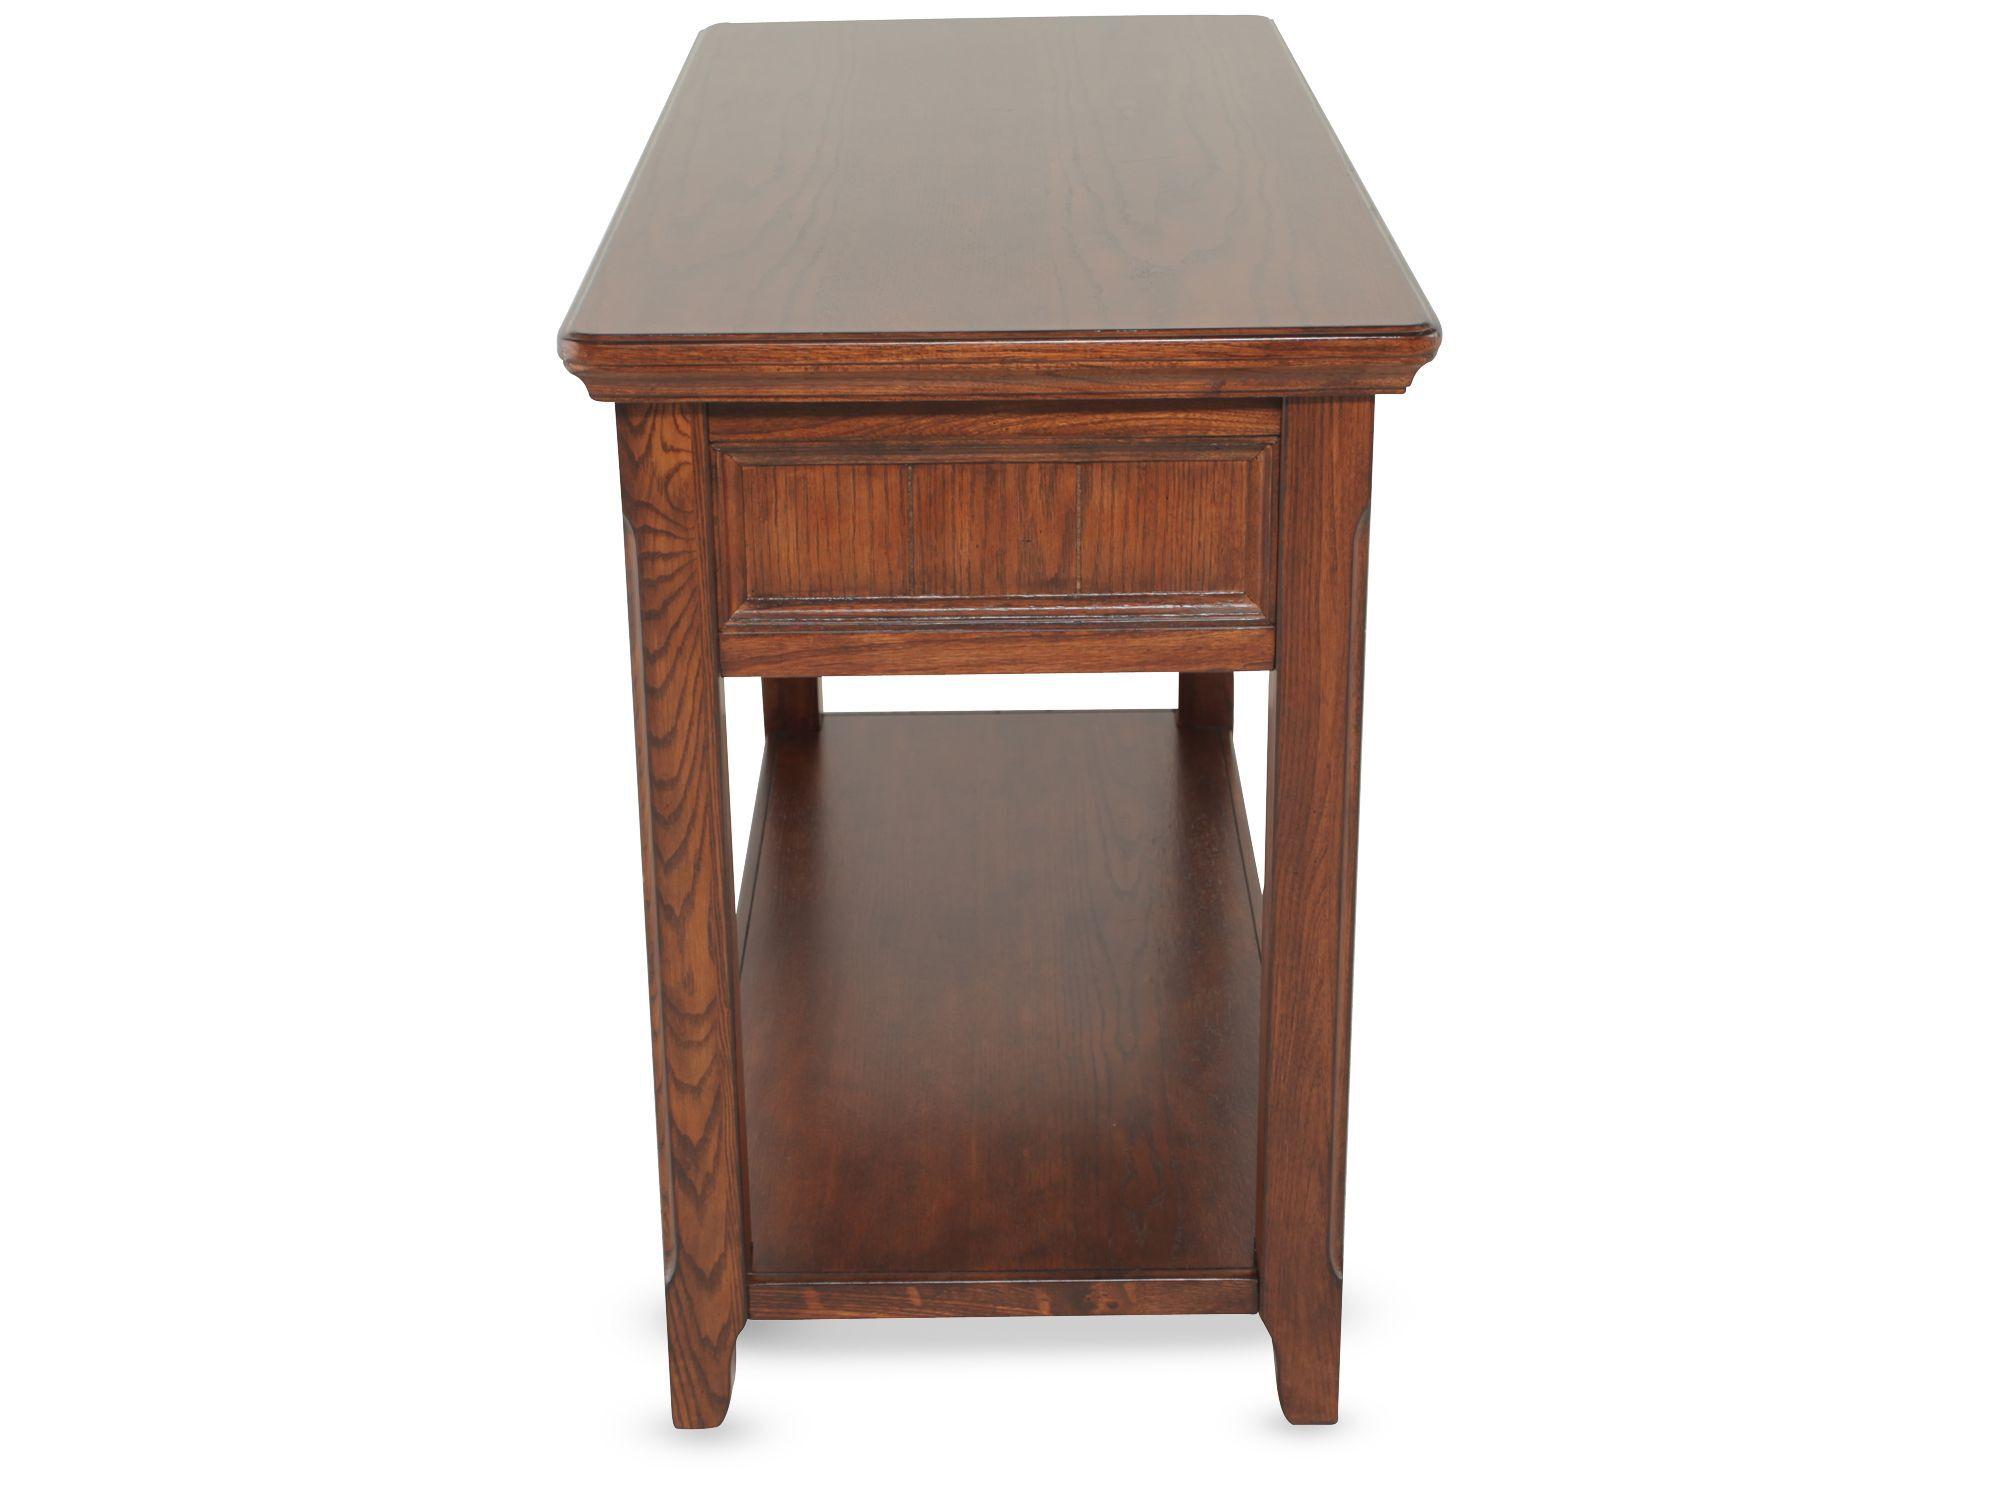 country cote sofa table kivik cover washing two drawer in dark brown mathis